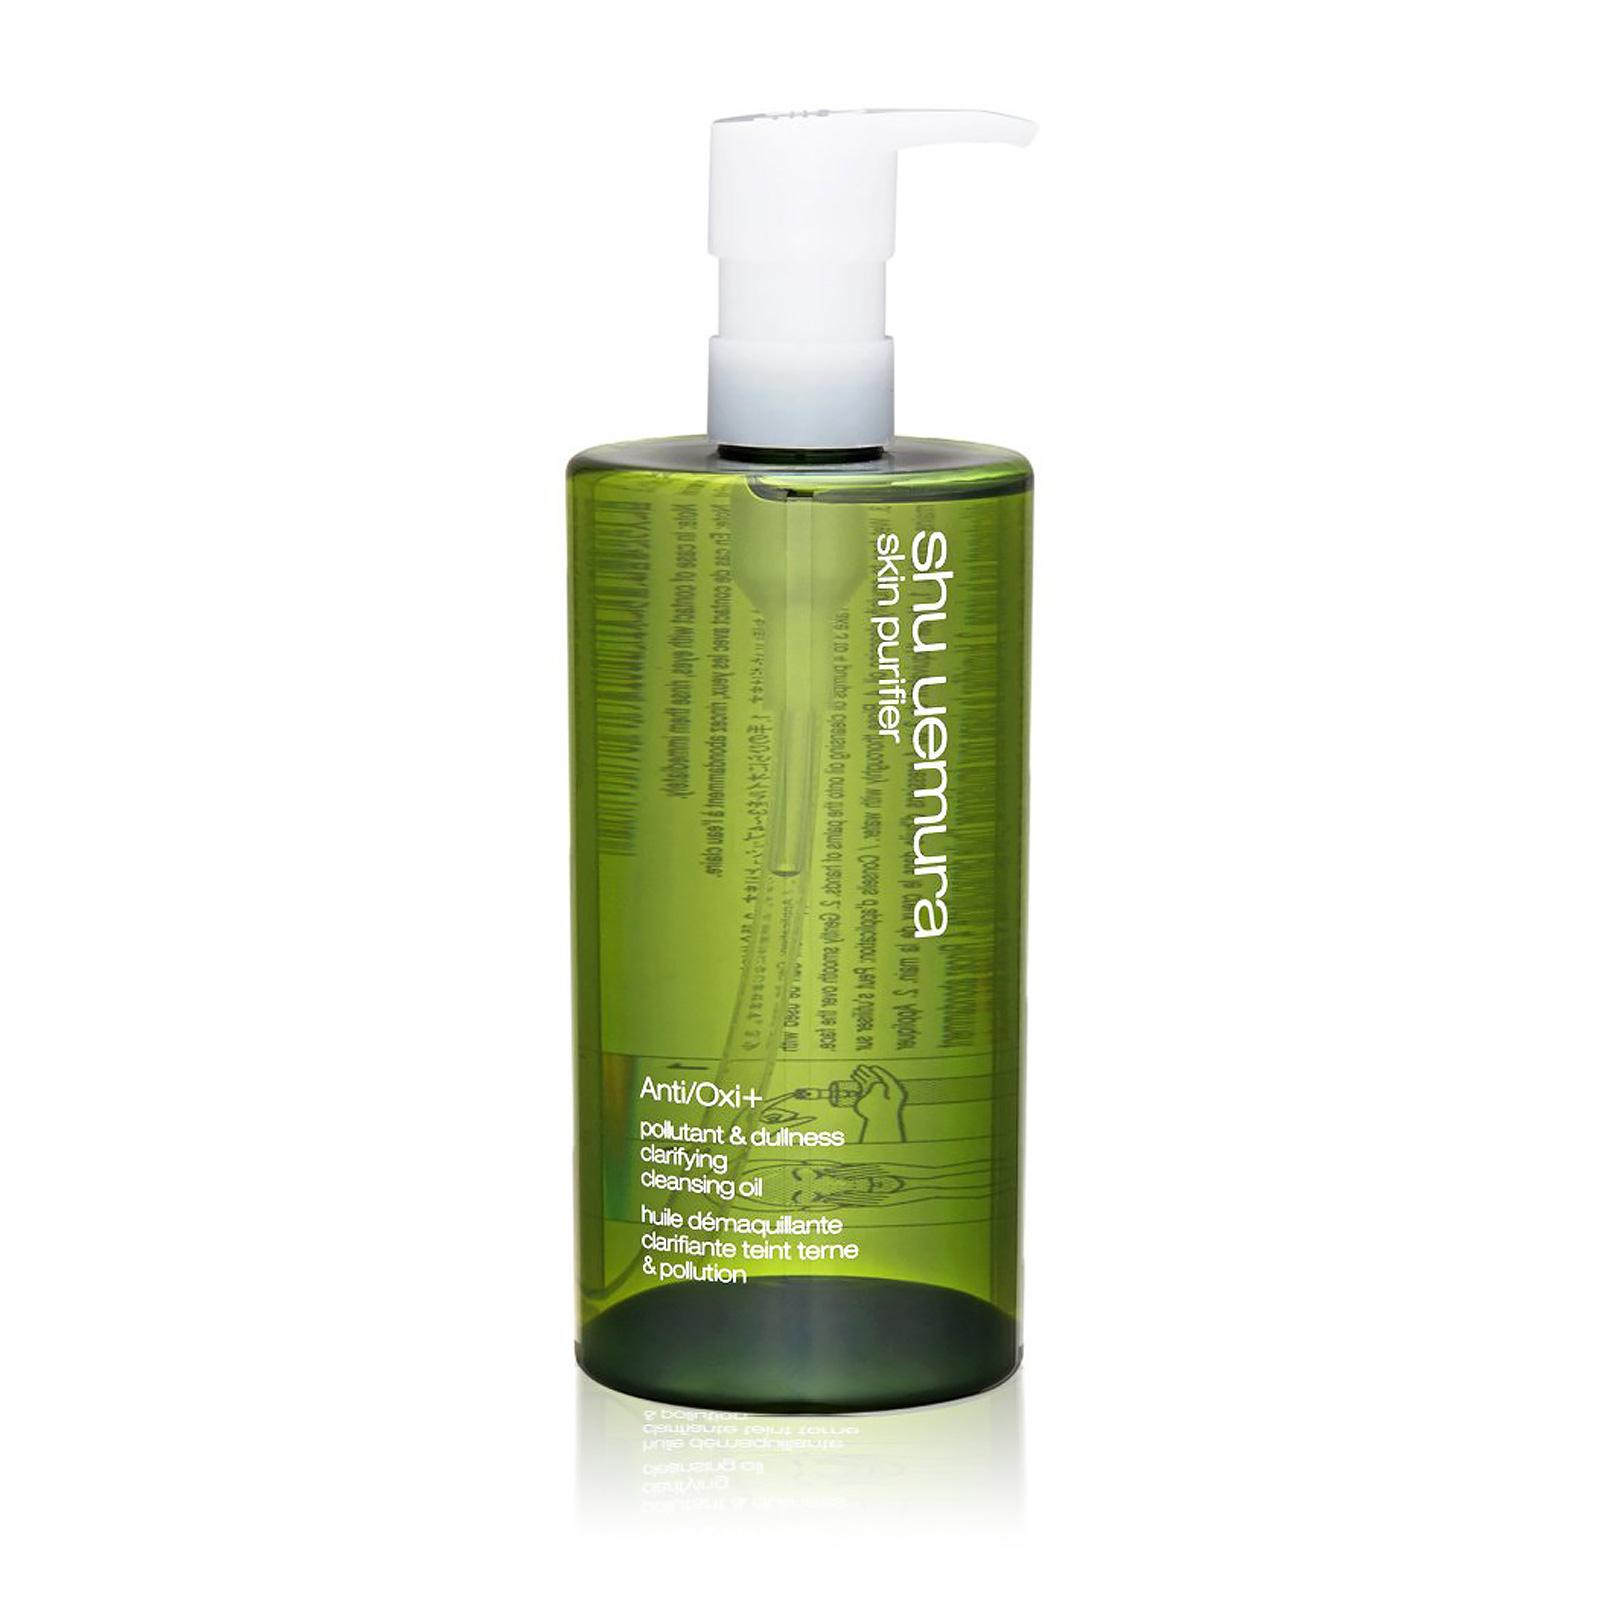 Skin Purifier Anti/Oxi+ Pollutant & Dullness Clarifying Cleansing Oil